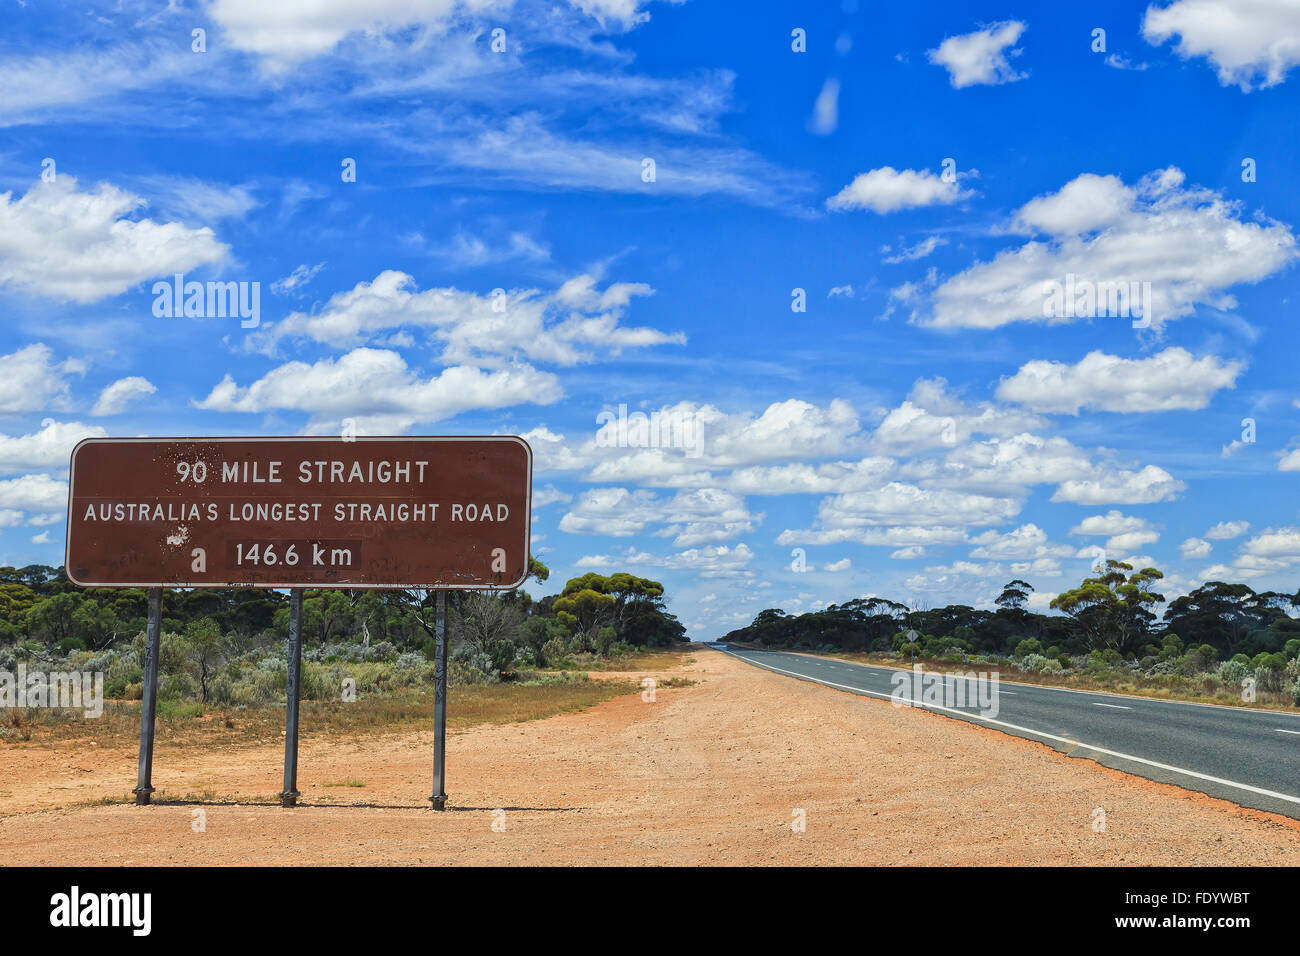 Roadsign information brun en Australie occidentale plaine du Nullarbor le long d'Eyre Highway 90 mile route Photo Stock